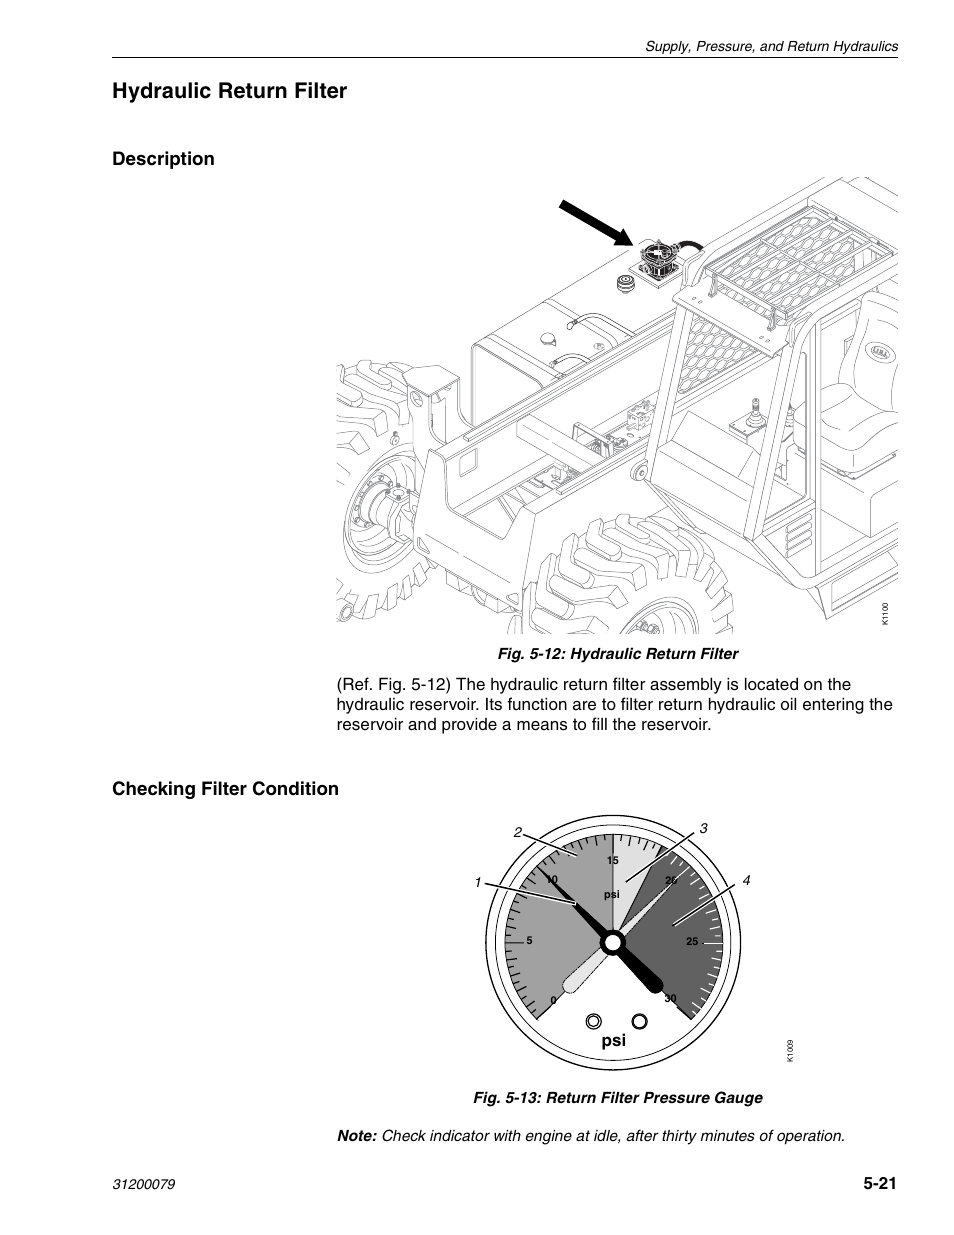 Hydraulic return filter, Description, Checking filter